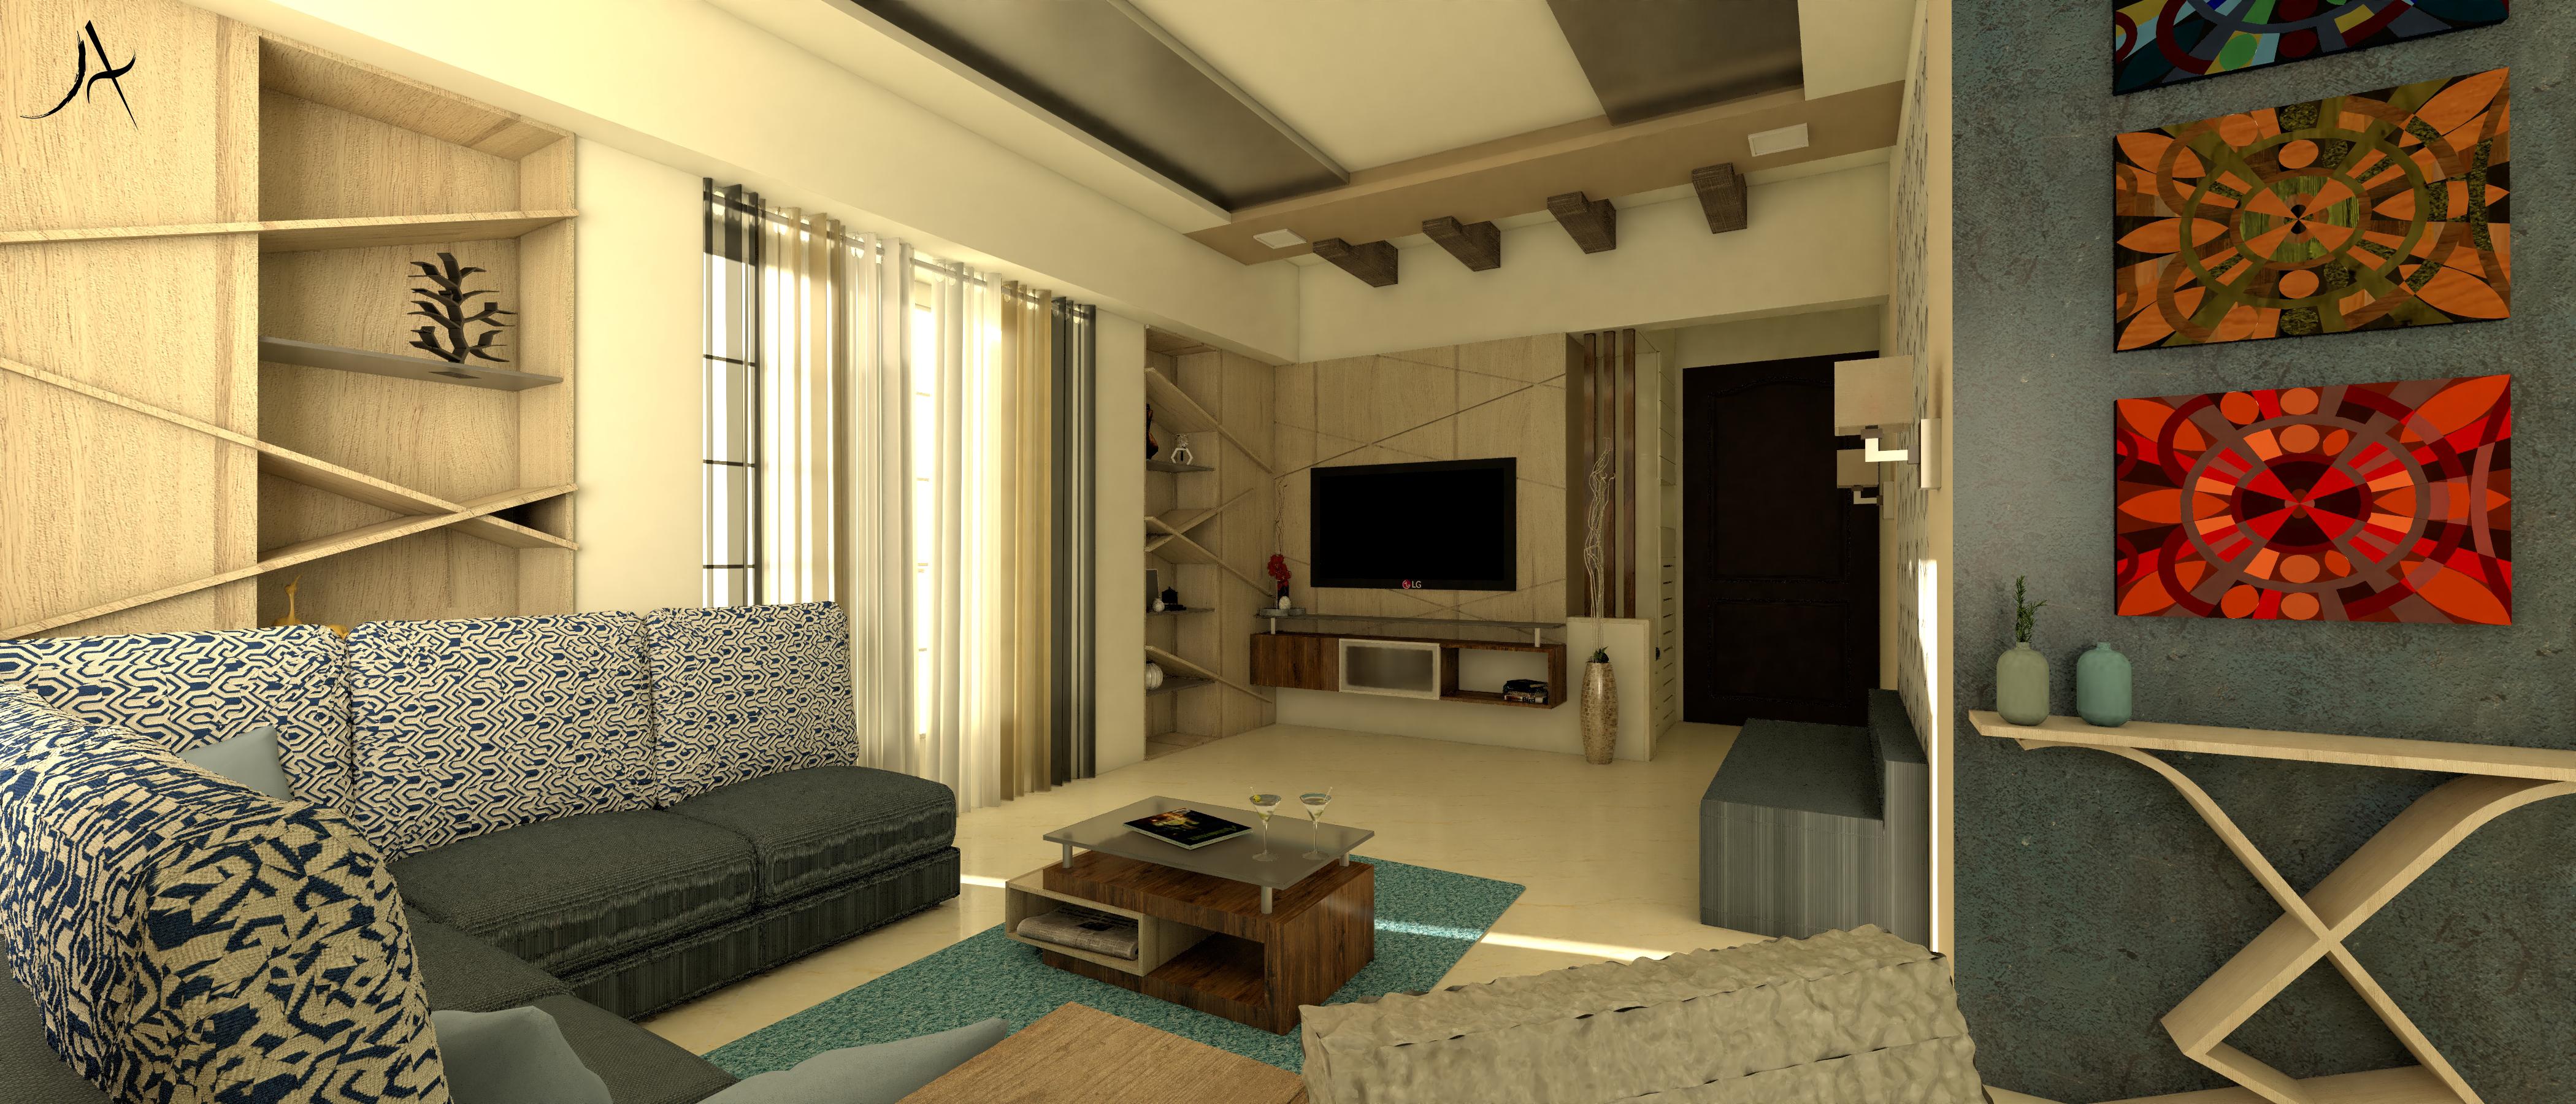 6 Hall view 6